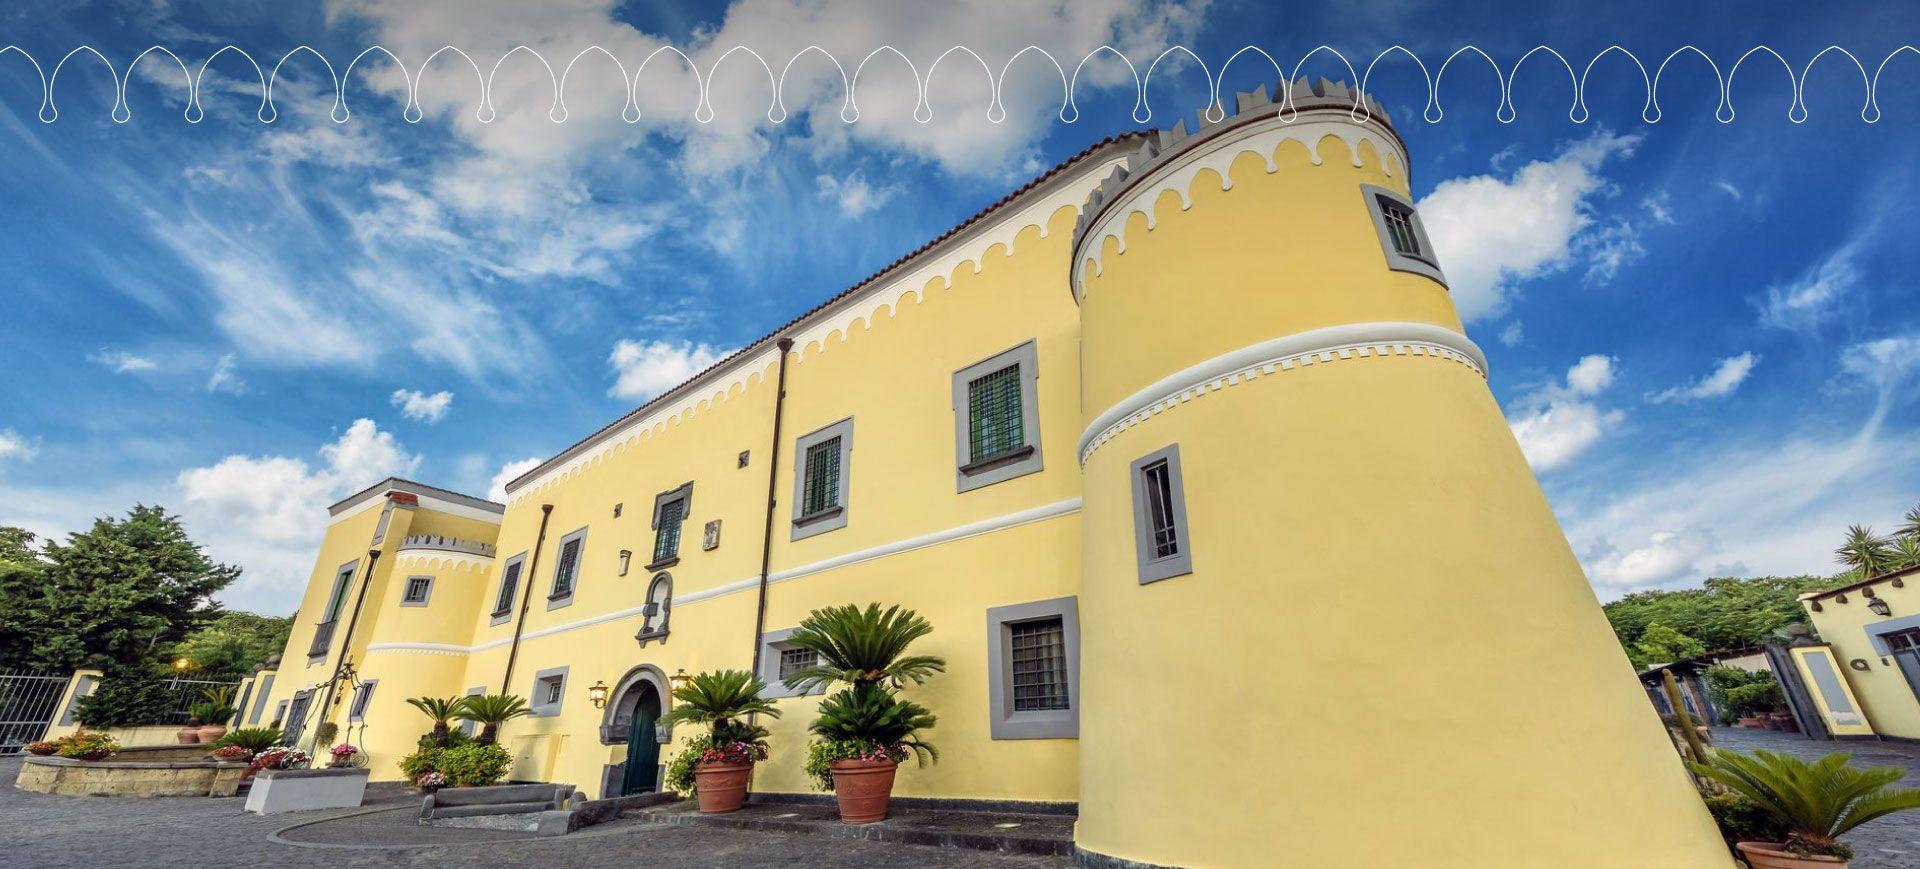 Location-Matrimonio-Napoli_02_1